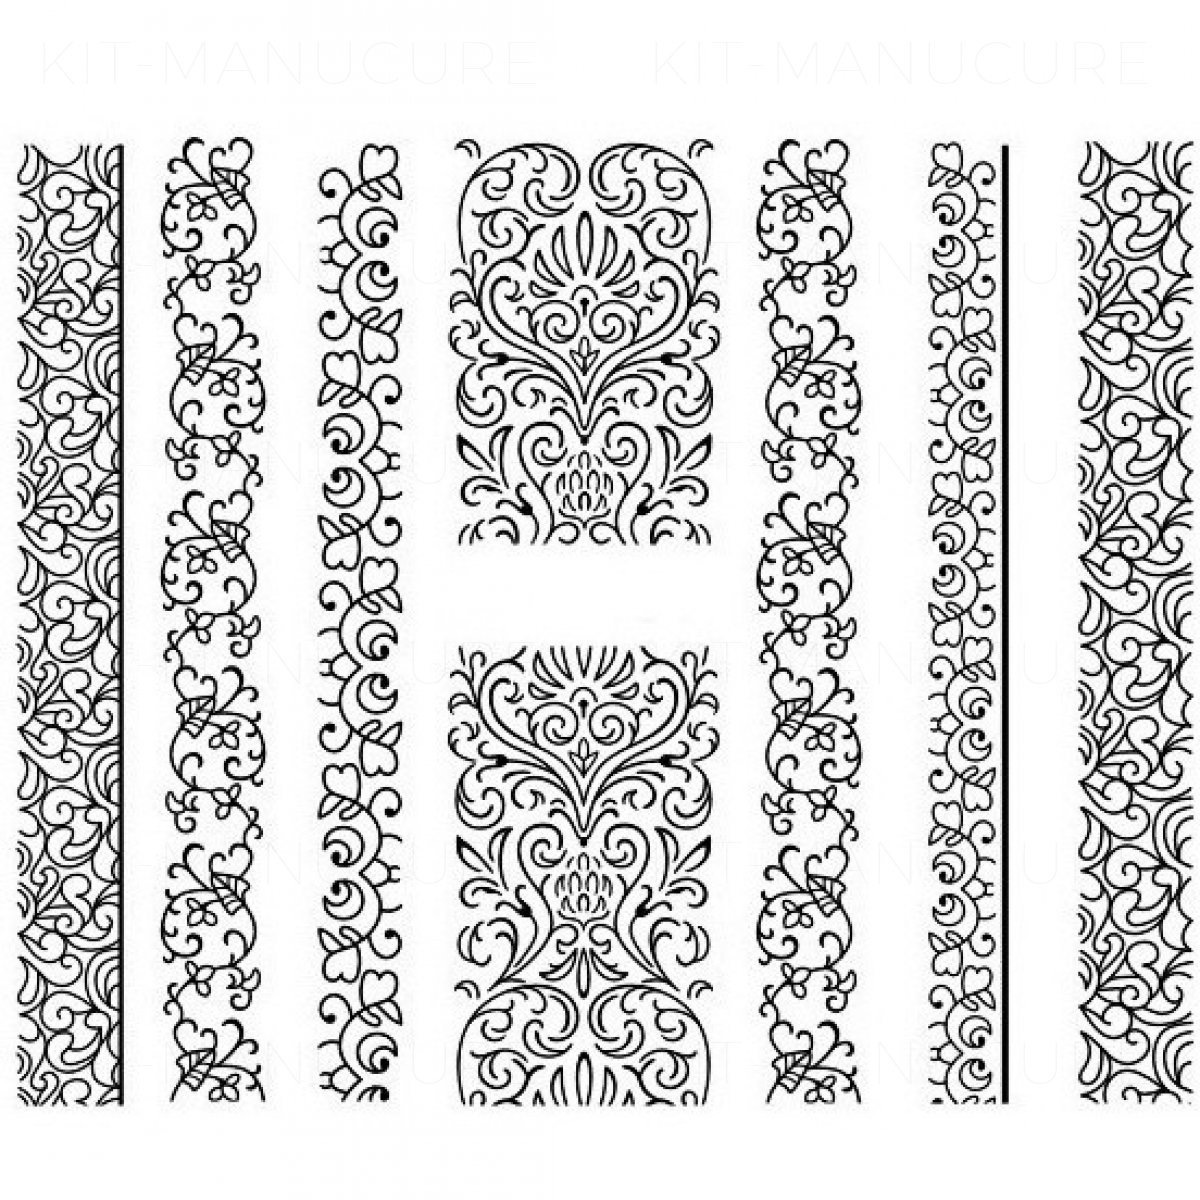 https://www.kit-manucure.com/2050-thickbox_default/water-decals-arabesques-façon-dentelle.jpg